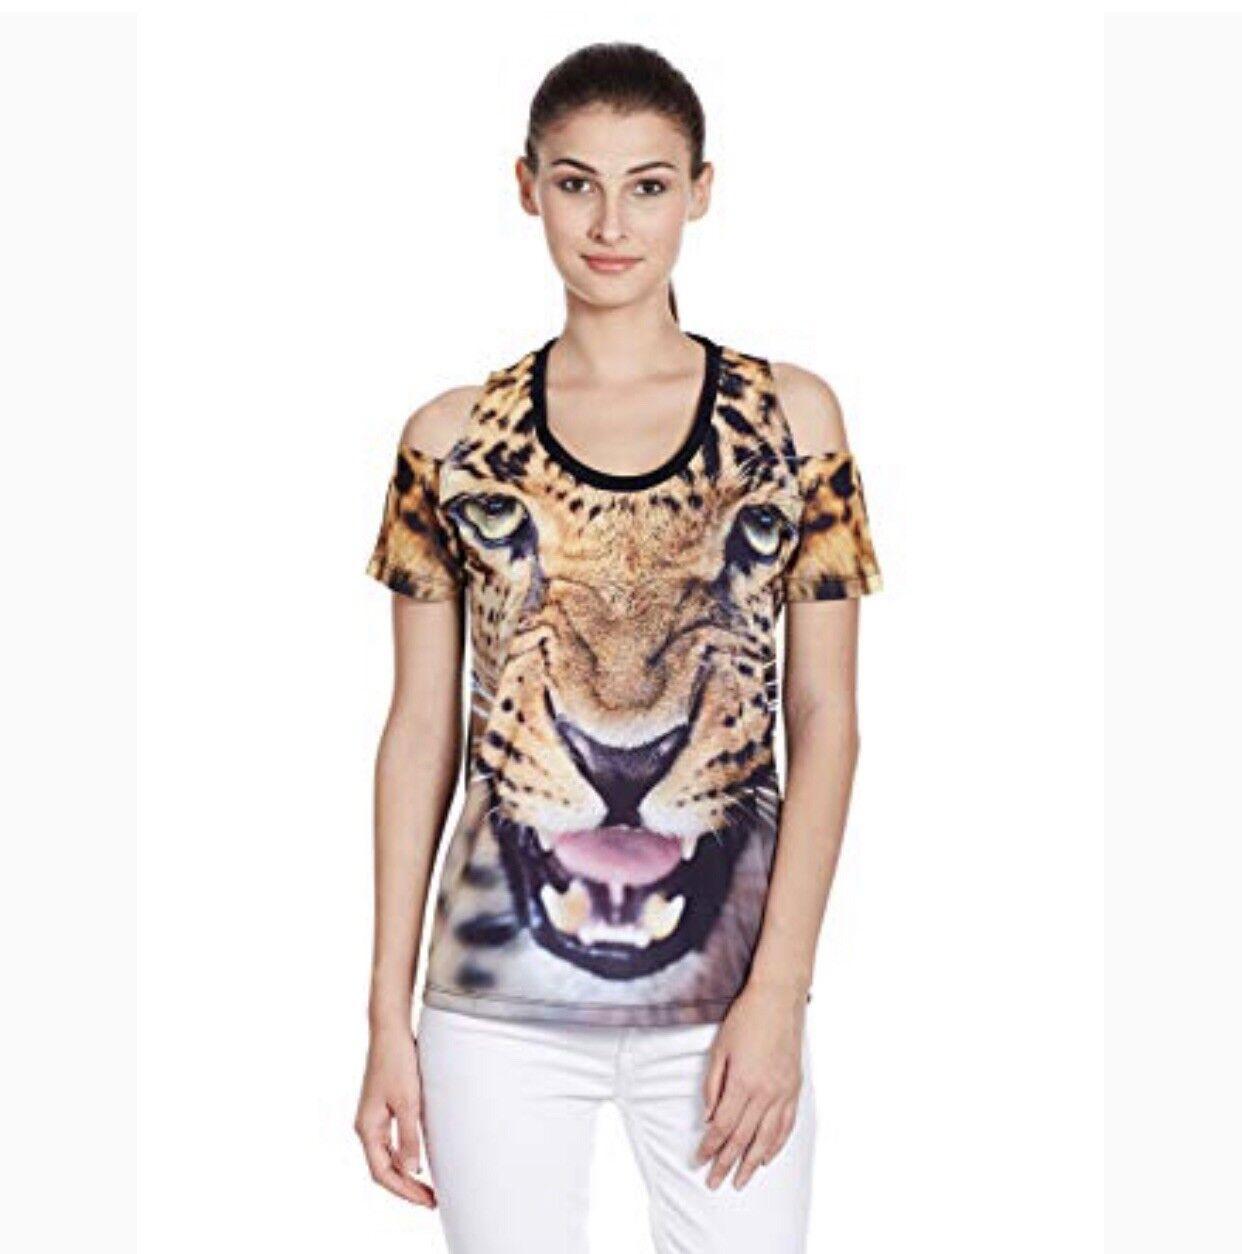 Adidas Original Jaguar Face Graphic ΓυναικΡία T-shirt μΡγέθους M / L